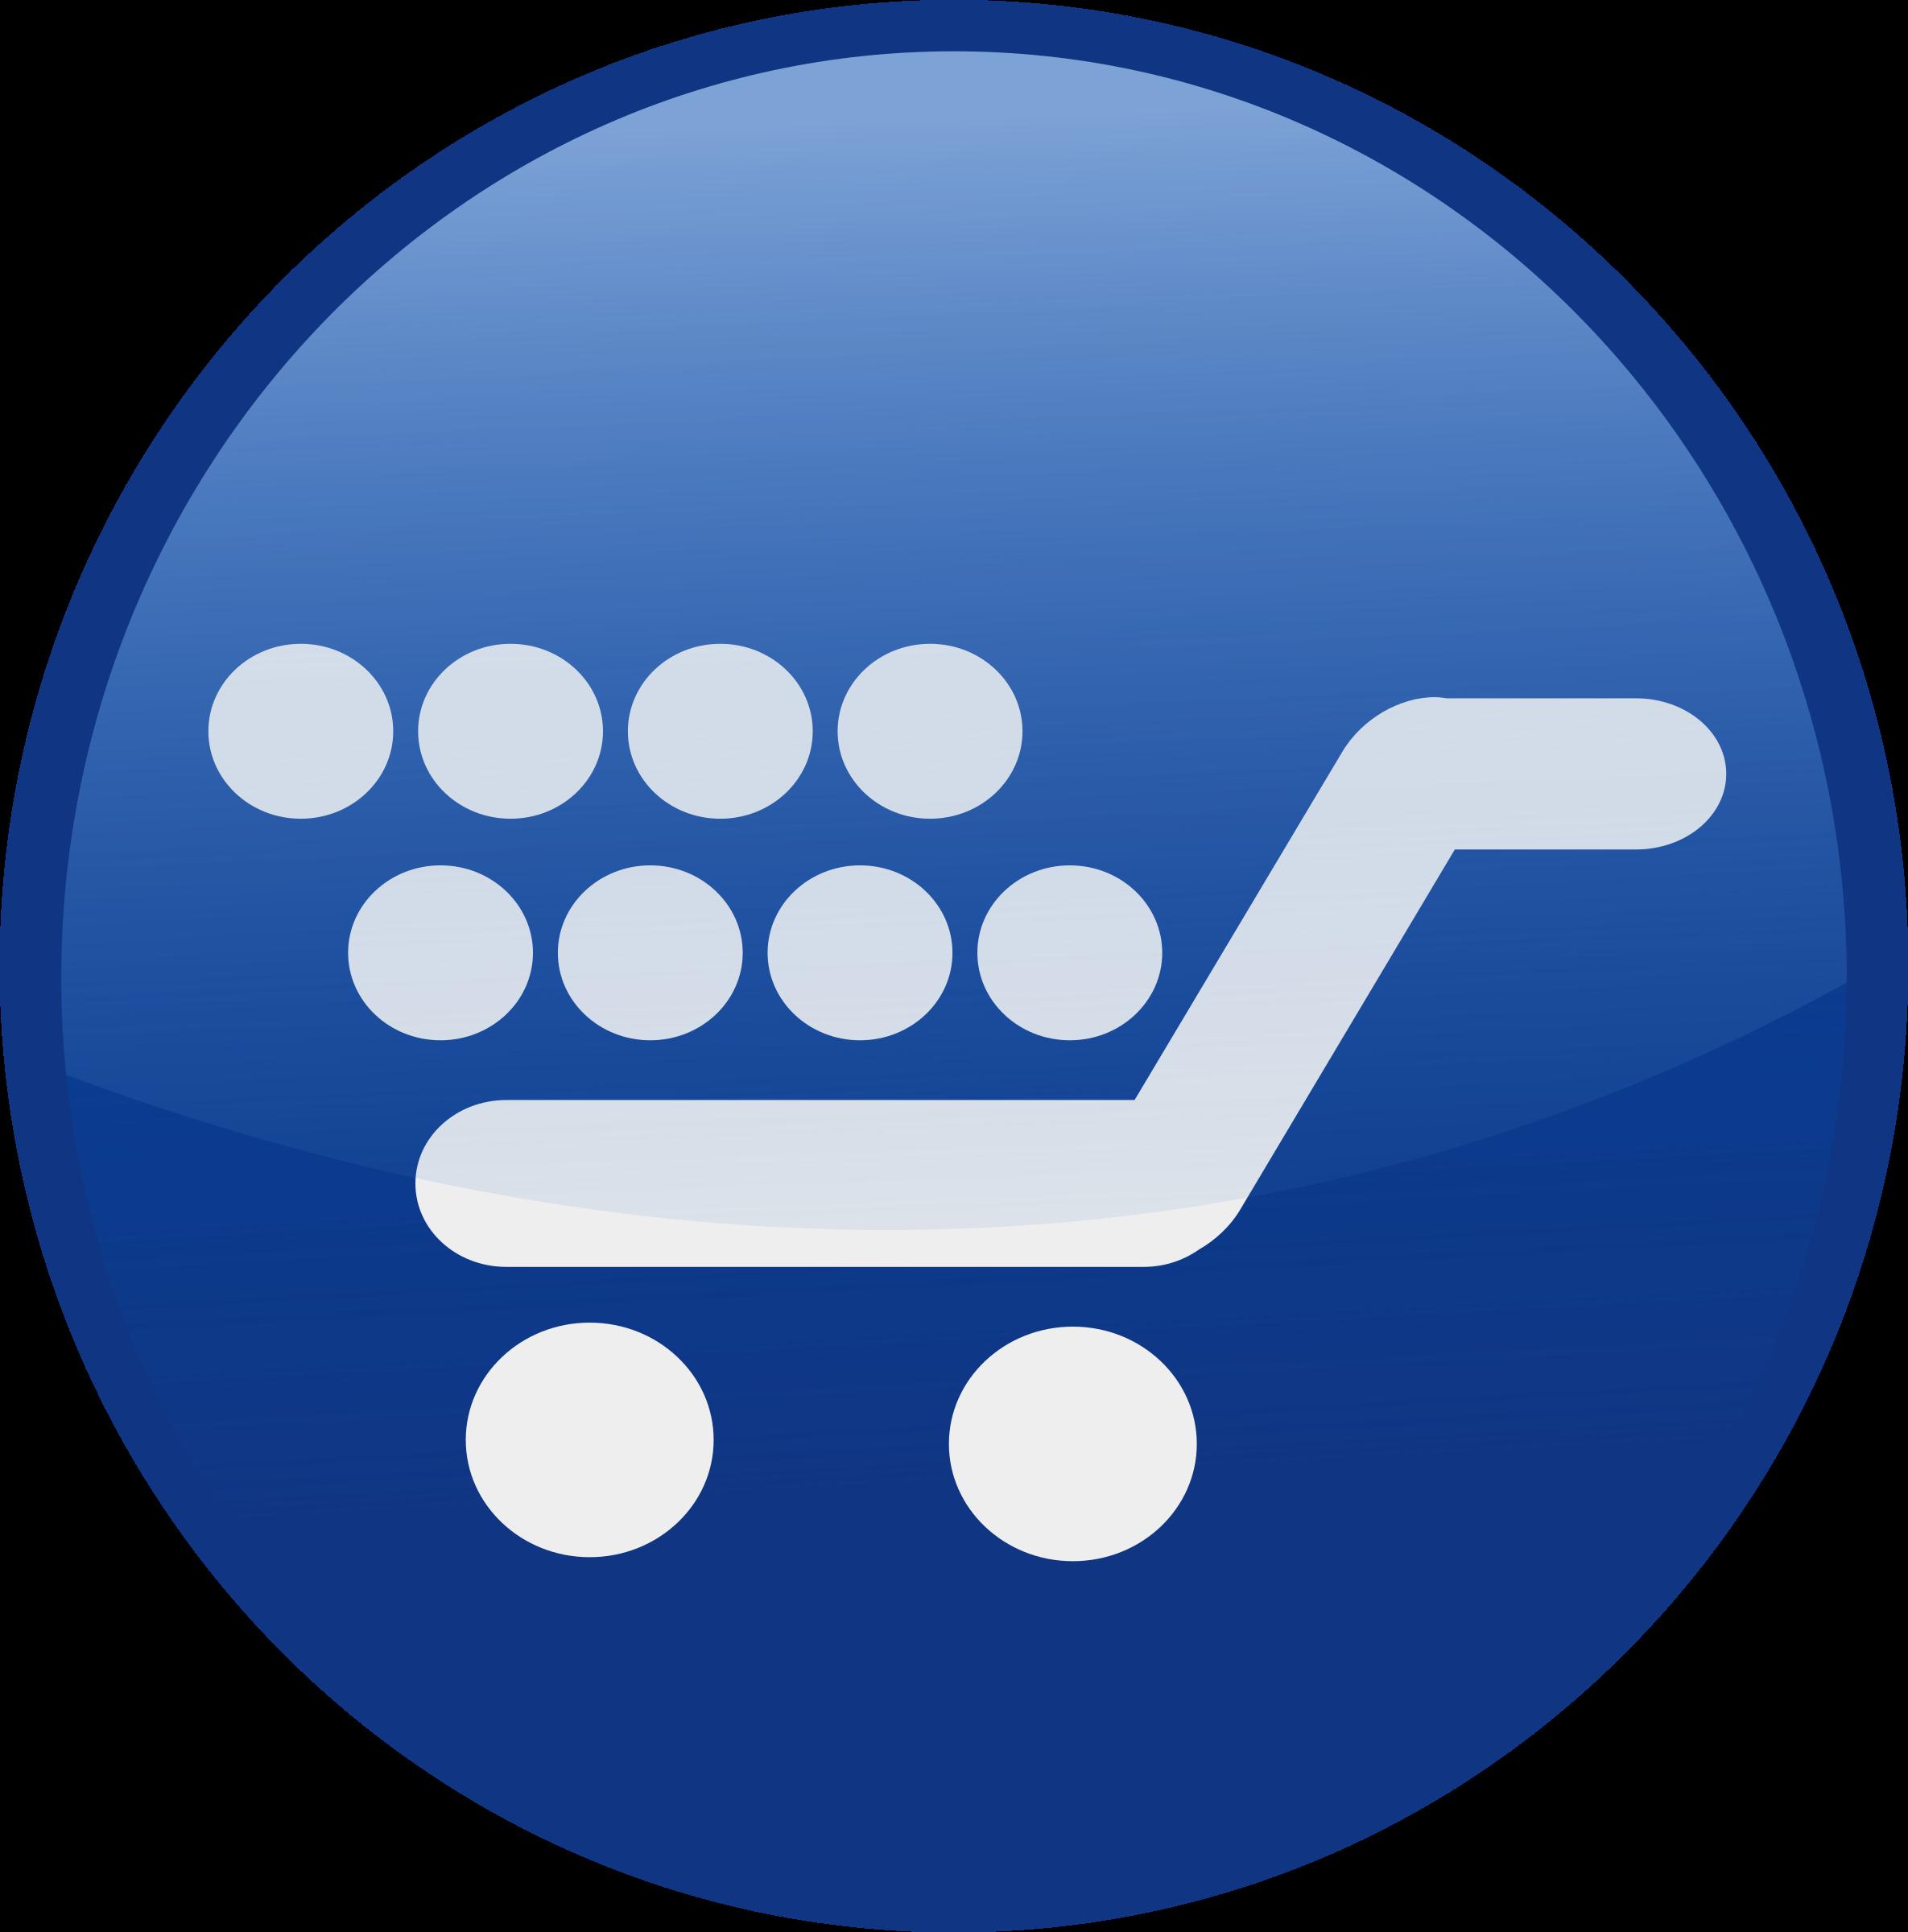 Clipart computer shopping. Cart blue big image